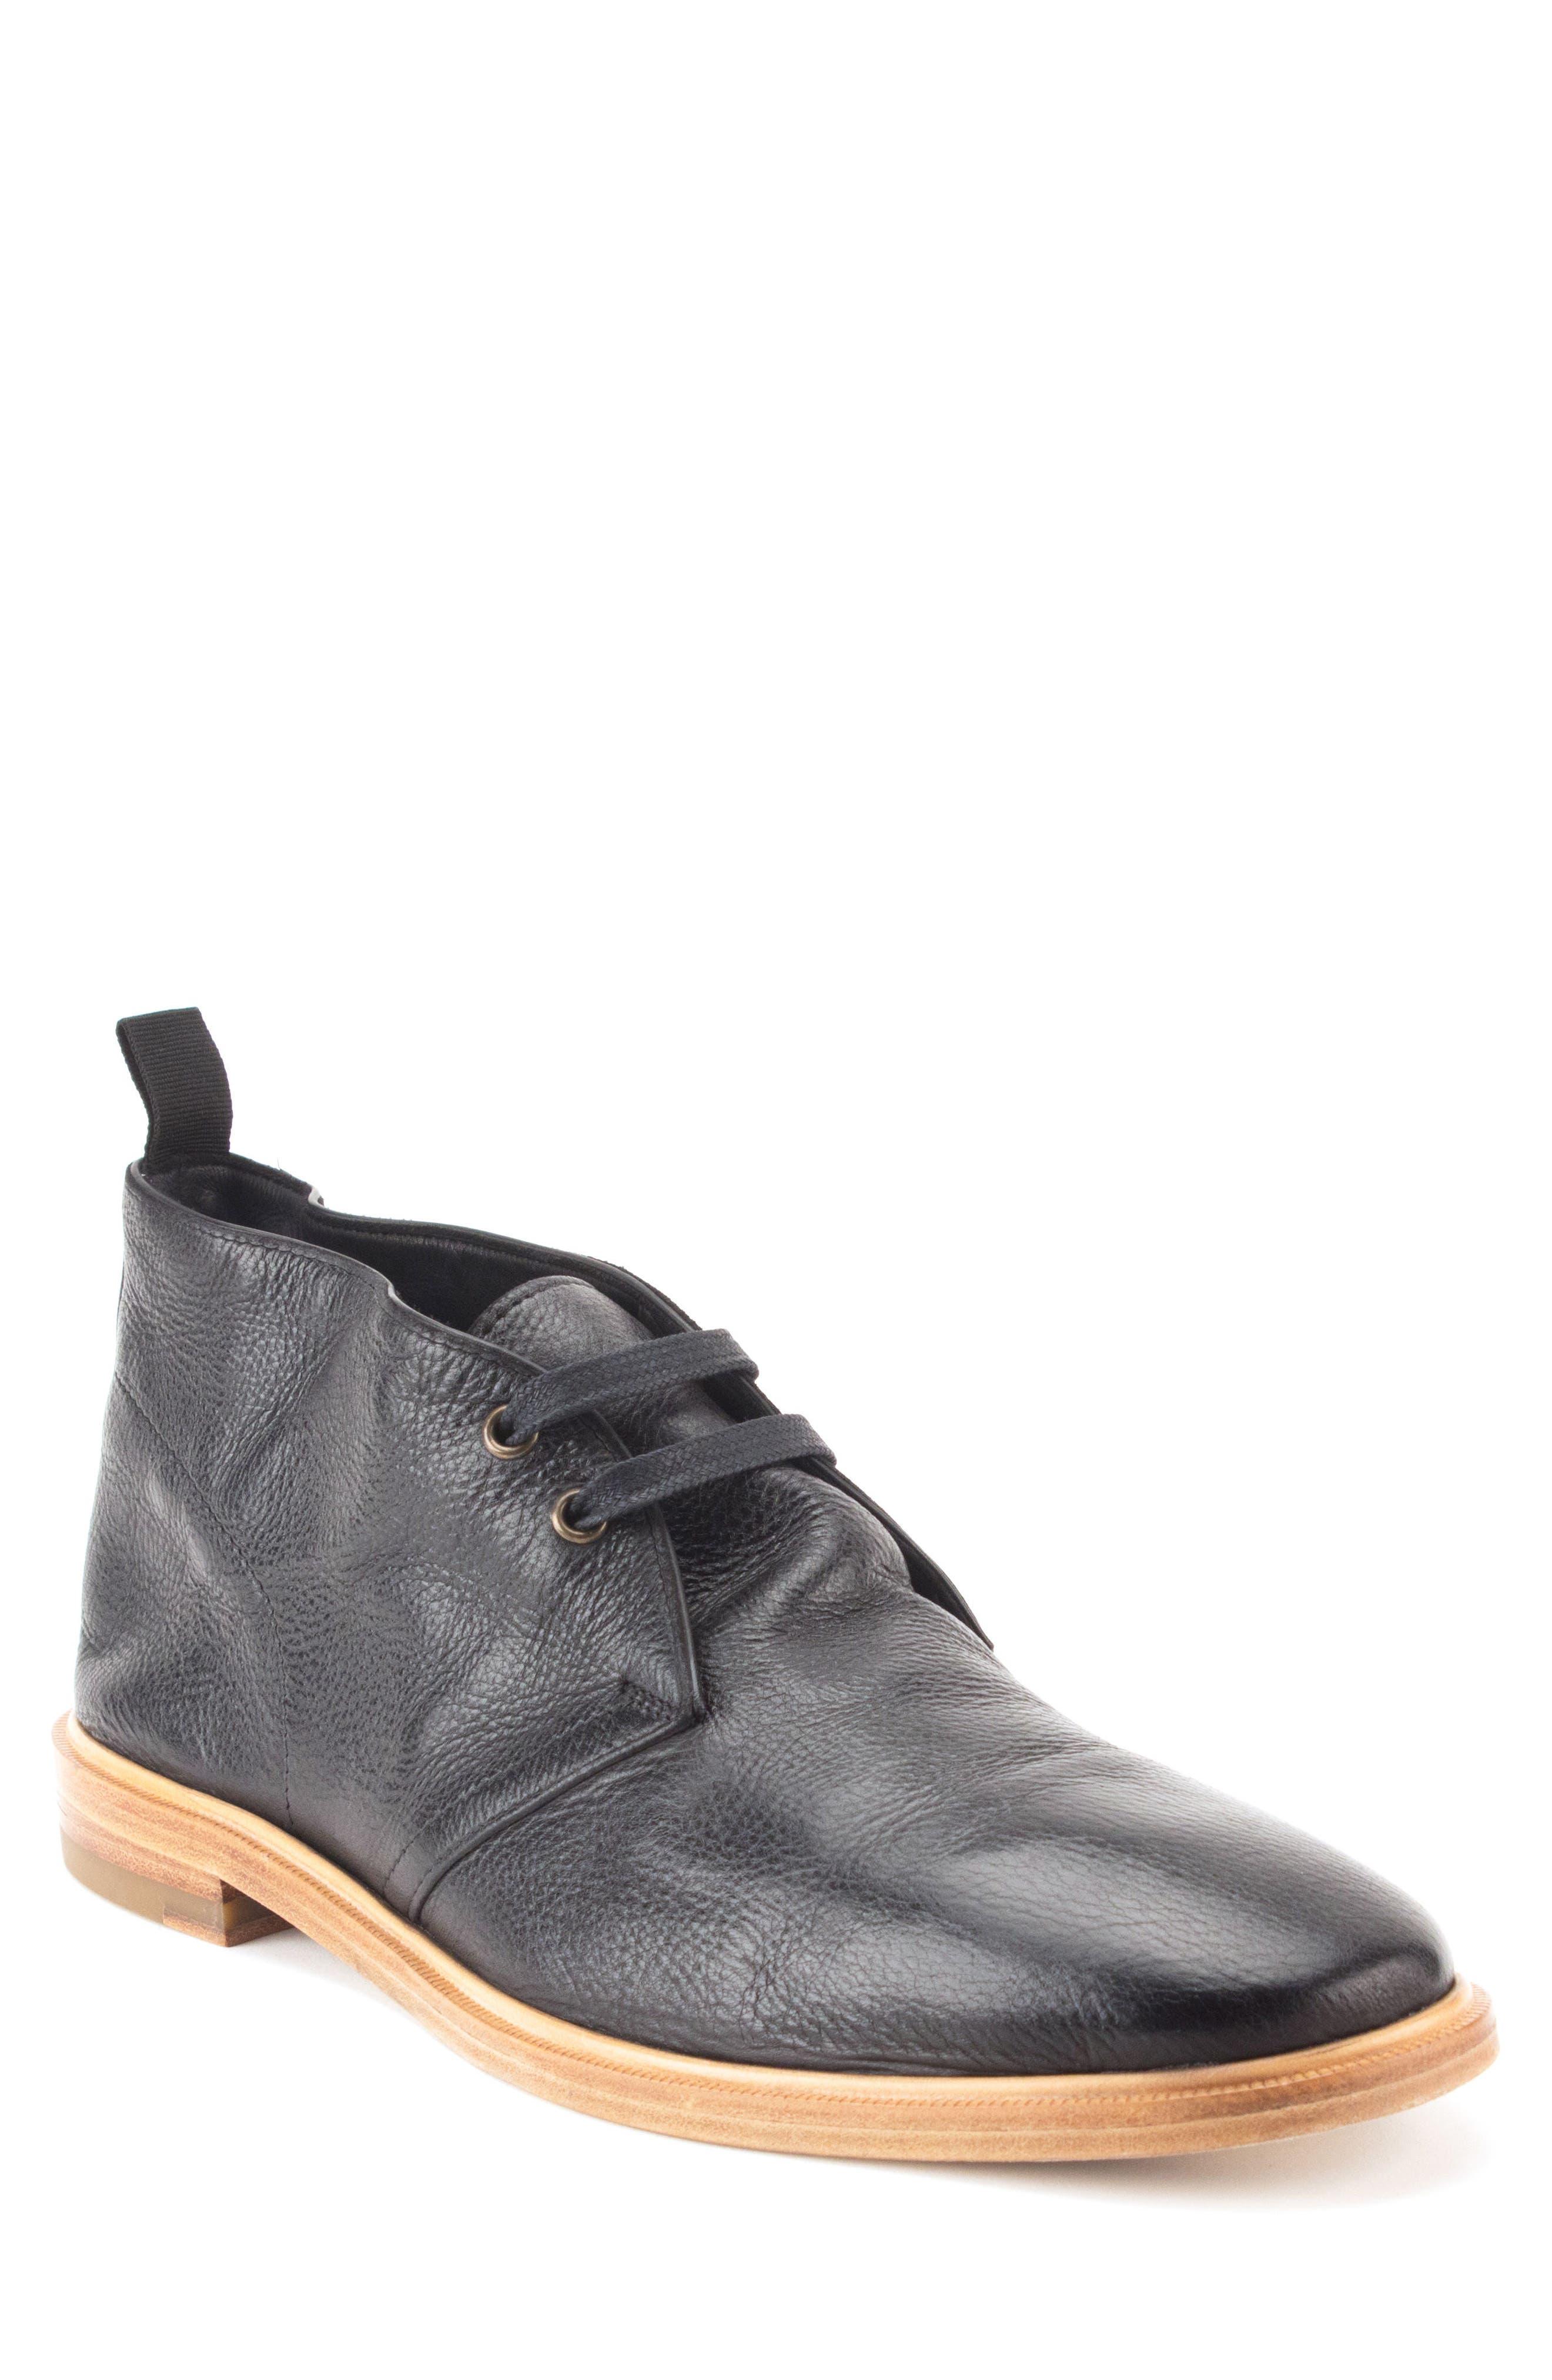 Luke Chukka Boot,                         Main,                         color, Black Leather